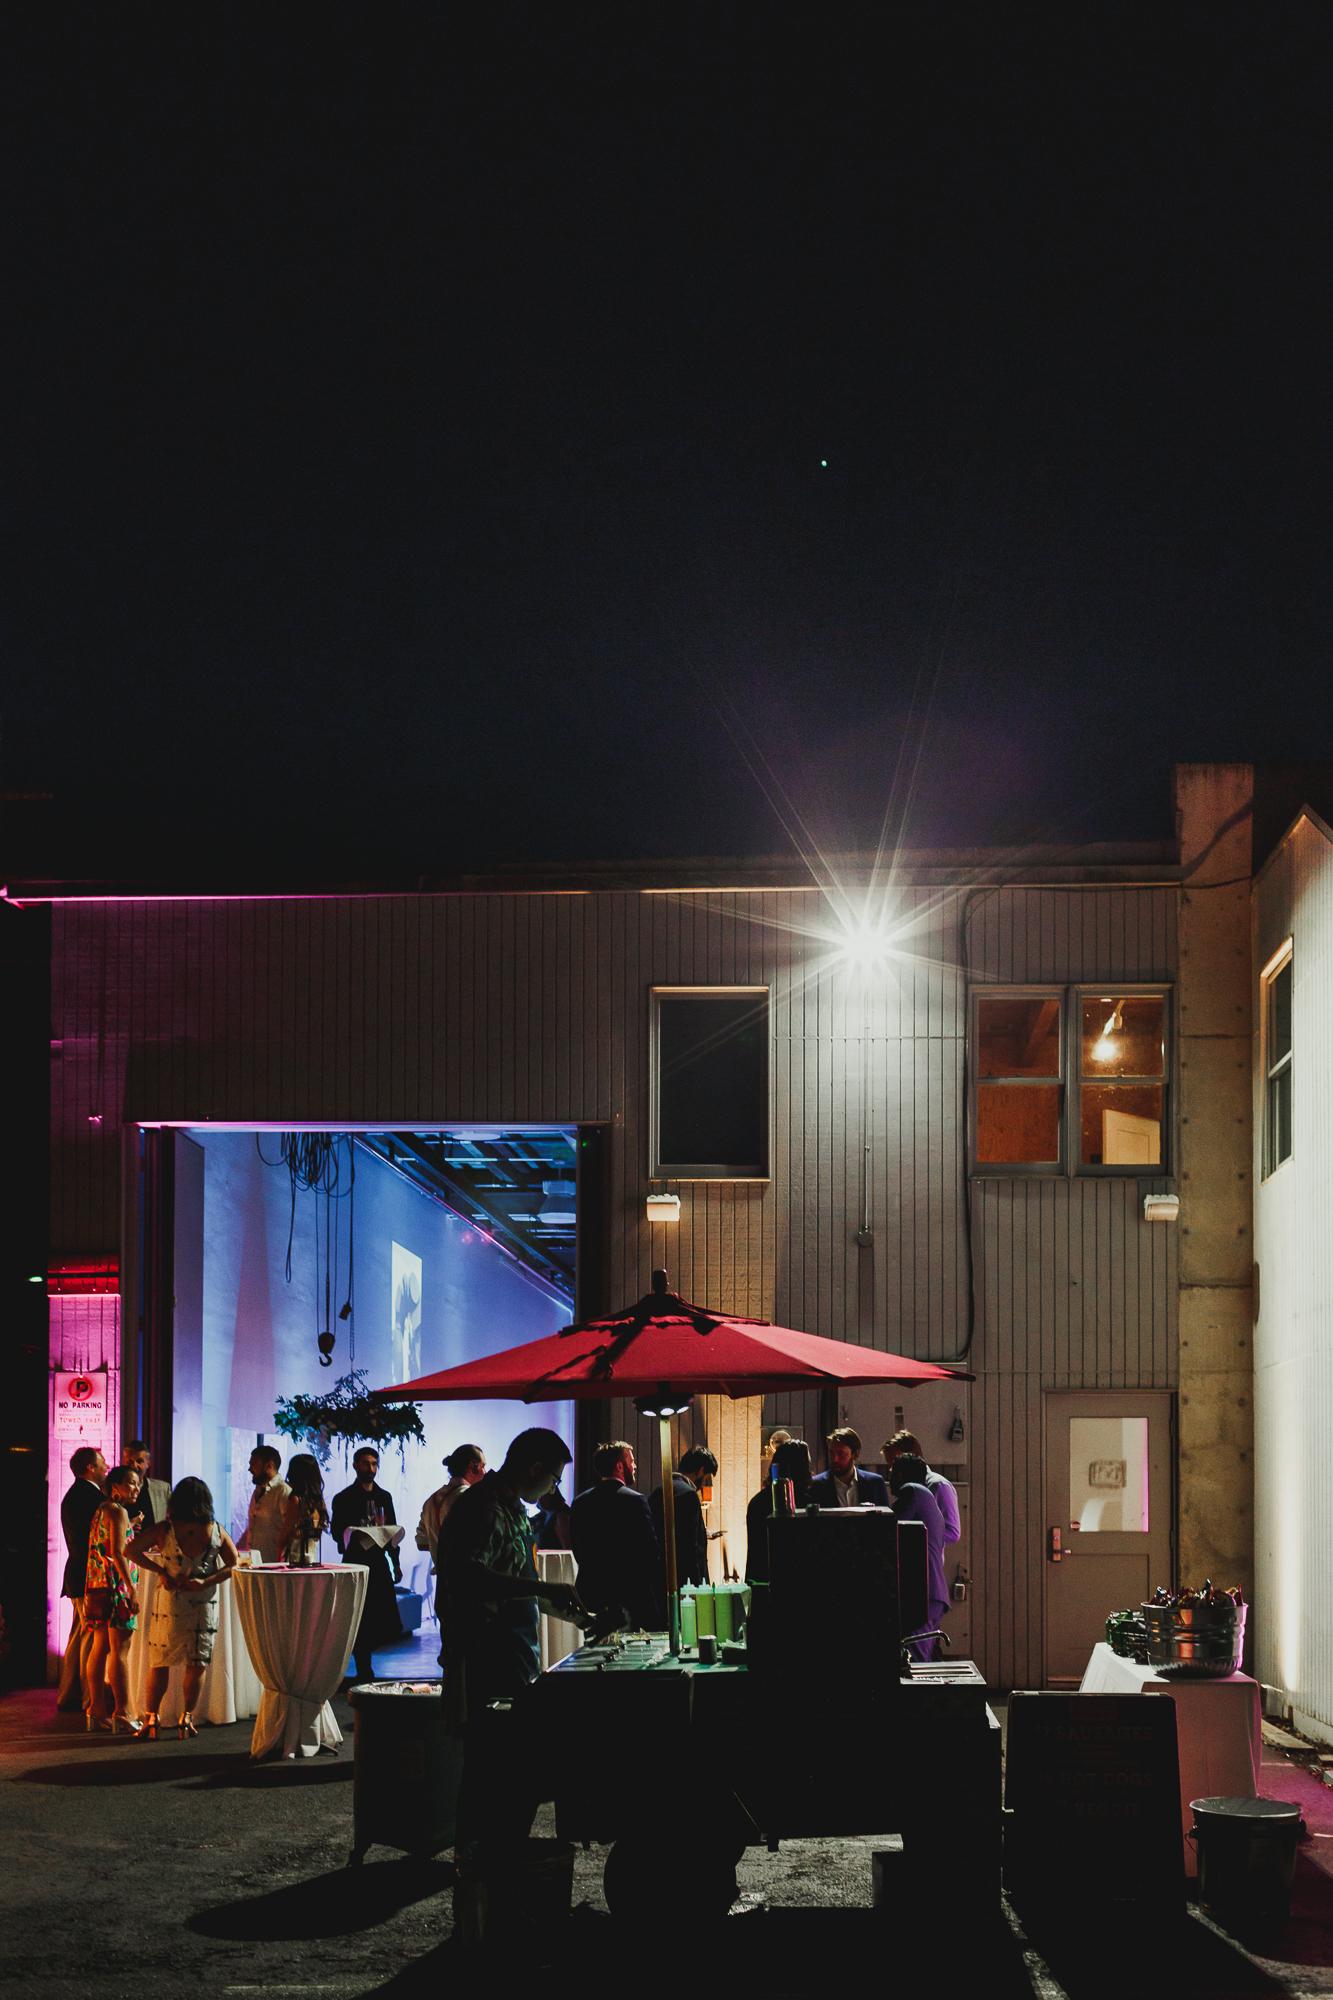 canvas event space wedding photos by Krista Welch-0163.jpg